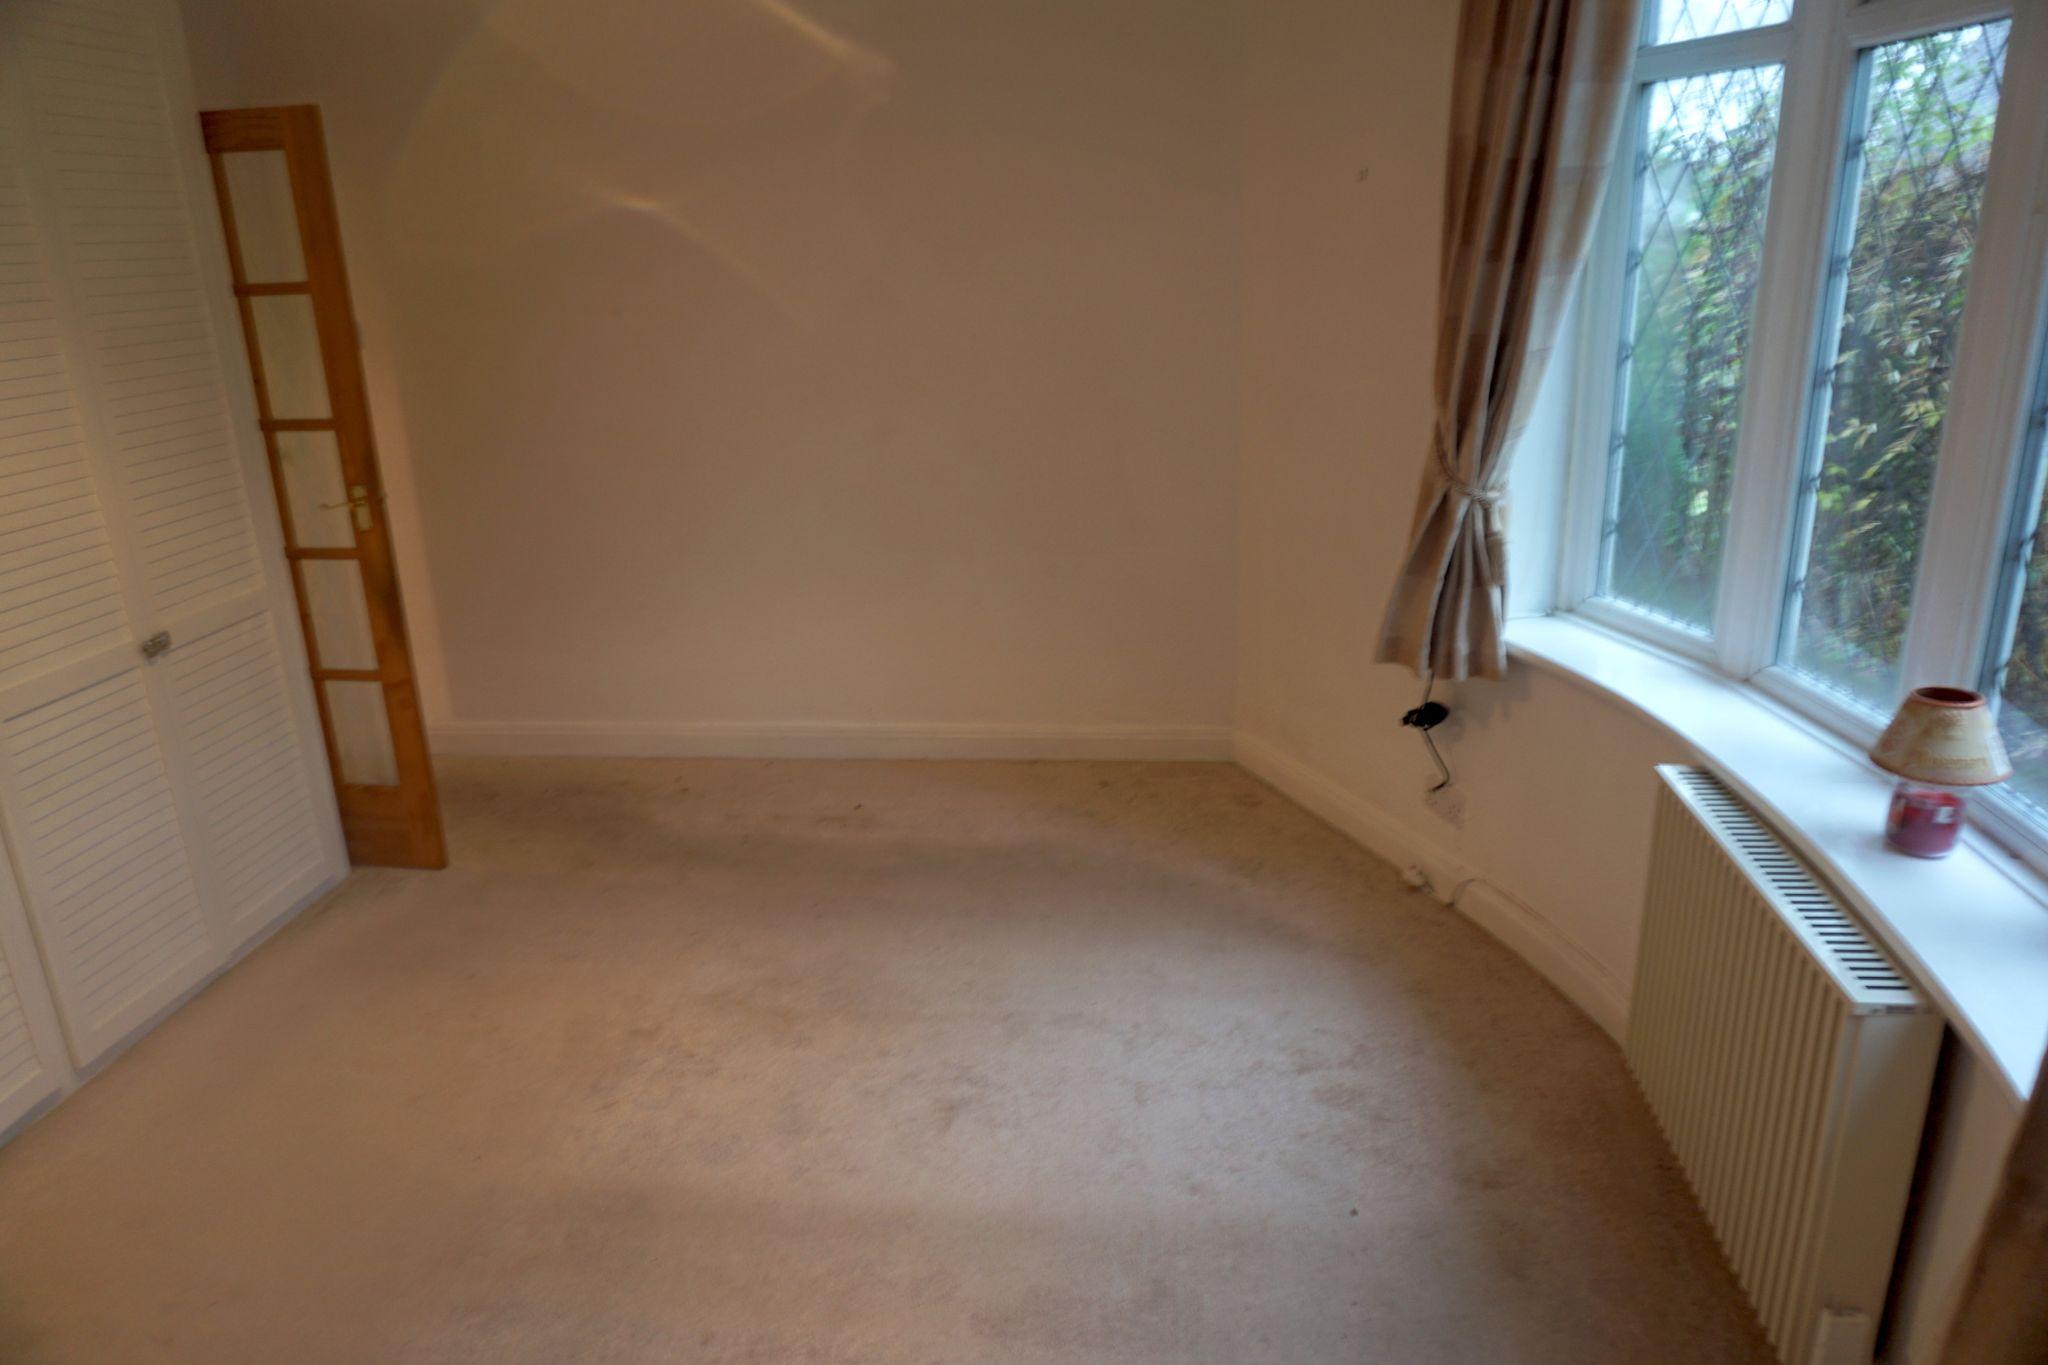 2 Bedroom Detached Bungalow For Sale - Master edroom 2